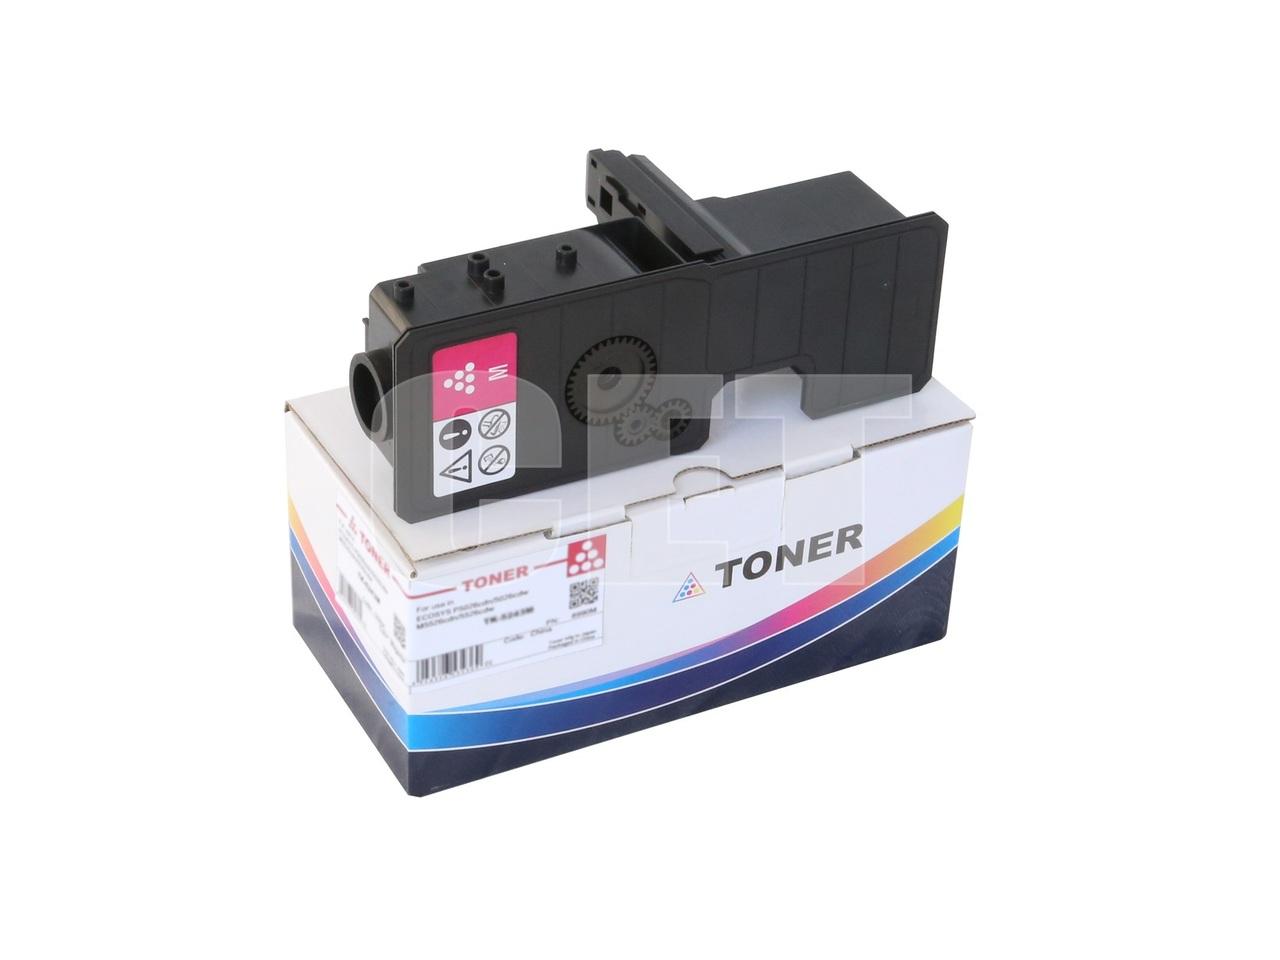 Тонер-картридж (PK208) TK-5230M для KYOCERA ECOSYSP5021cdn/M5521cdn (CET) Magenta, 33г, 2200 стр., CET8995M